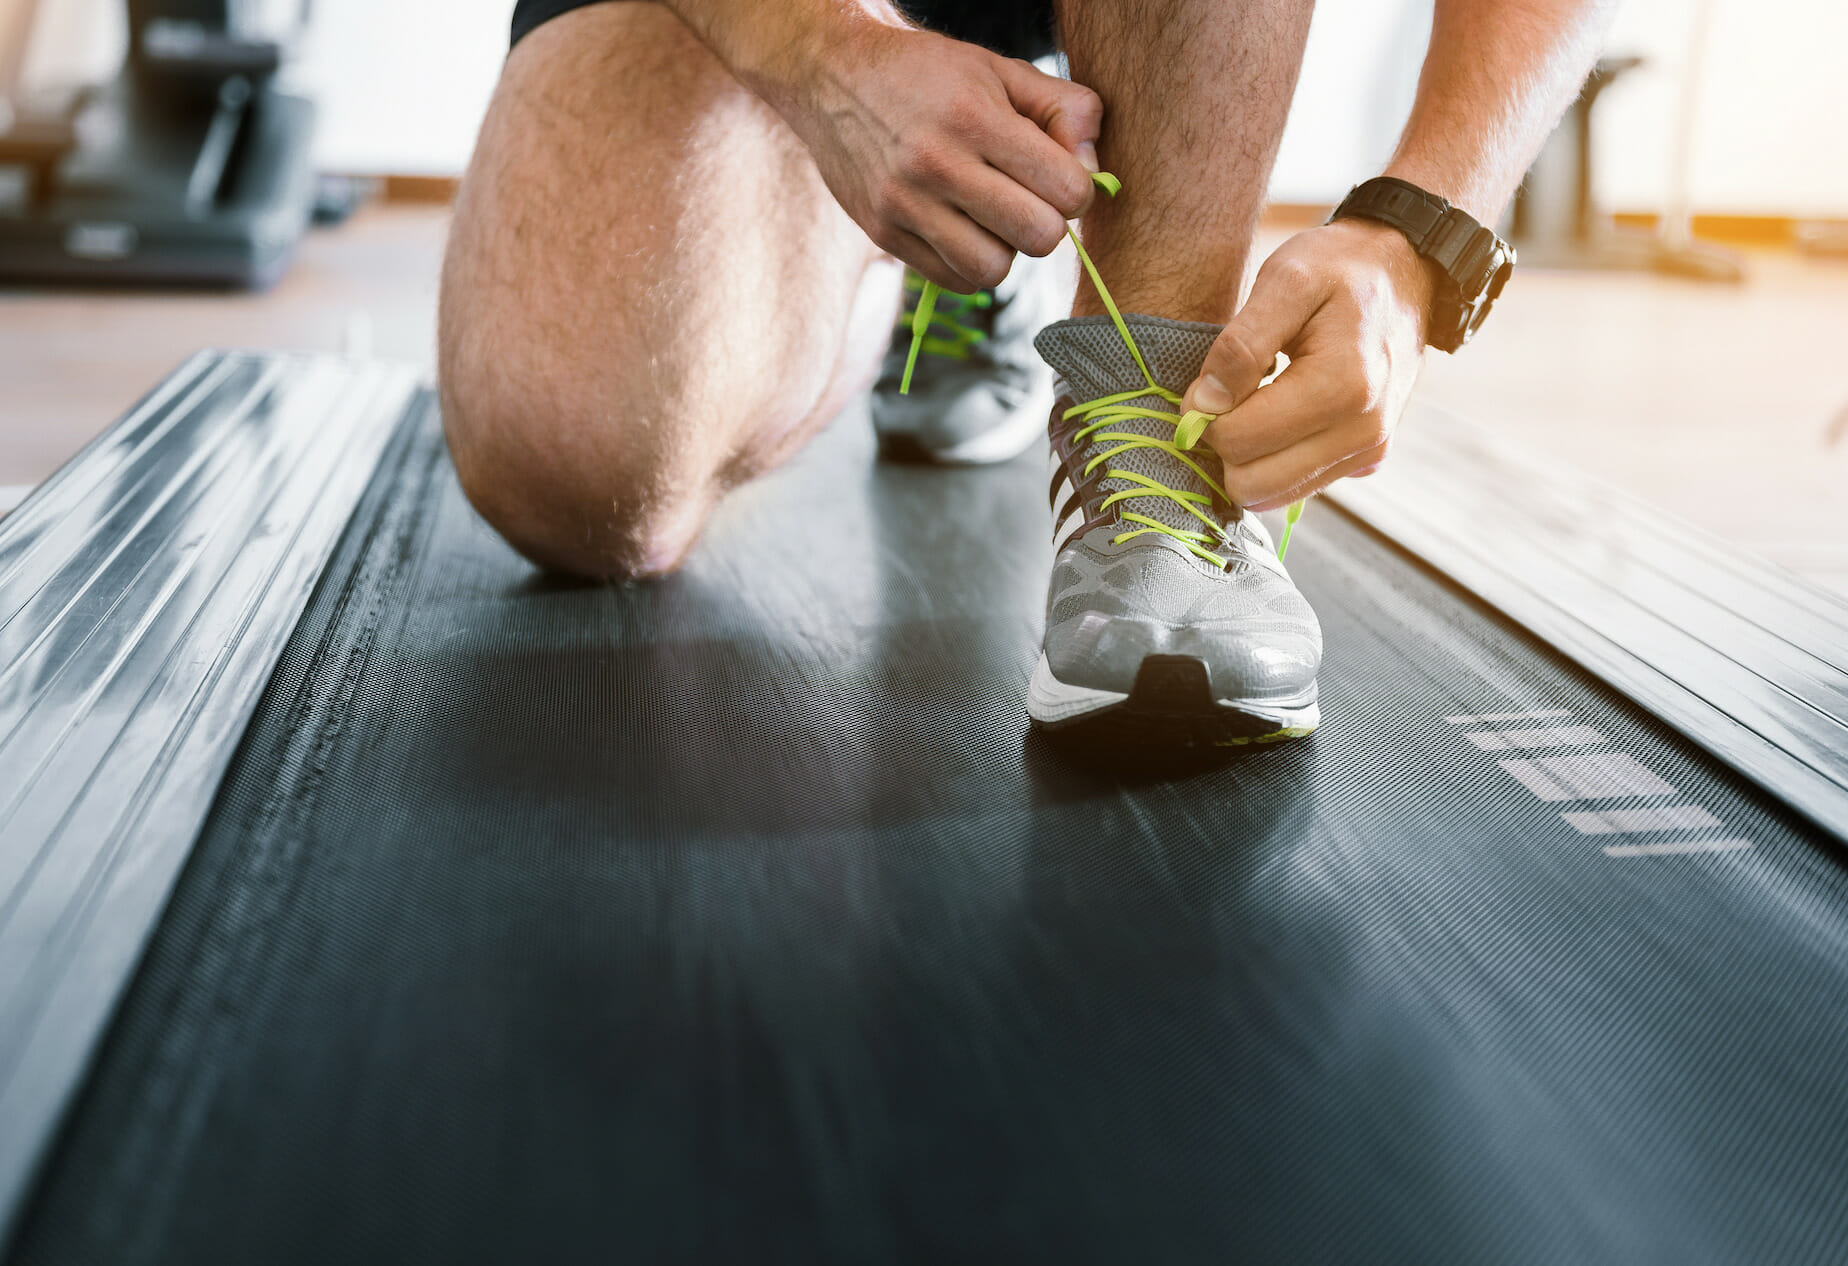 5 best sunny health and fitness treadmills